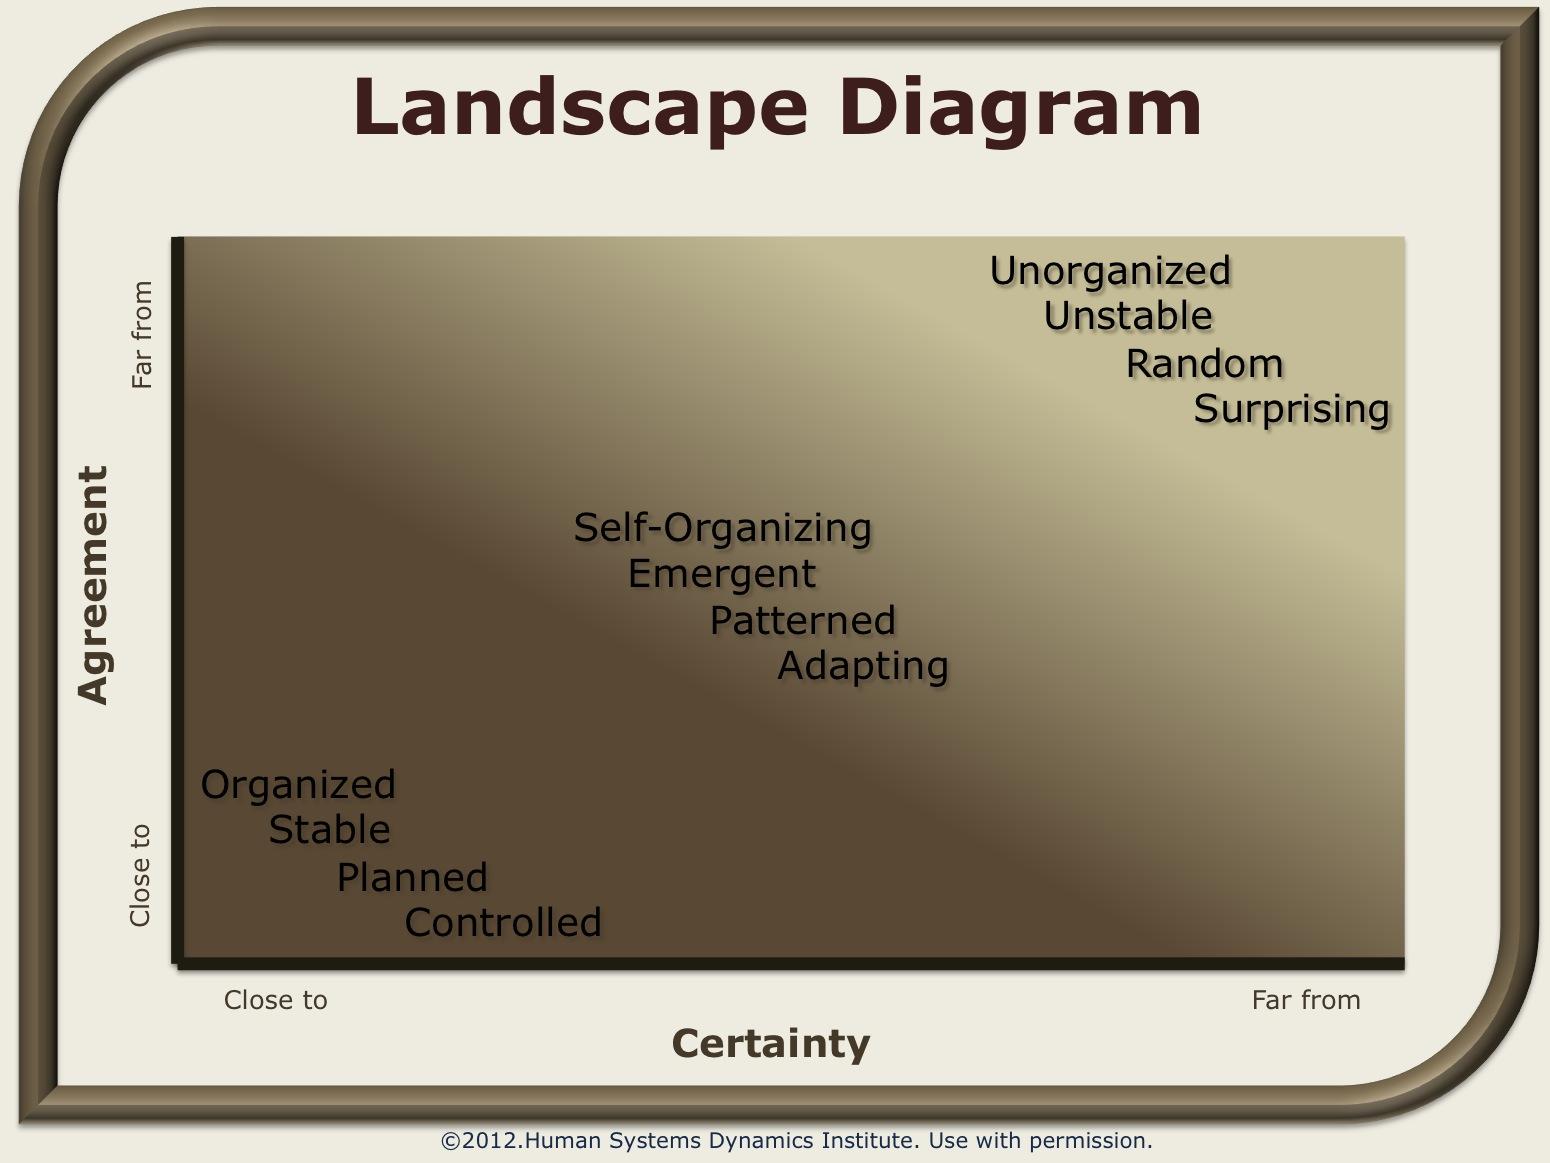 landscape_diagram.wiki.jpg?1344373632